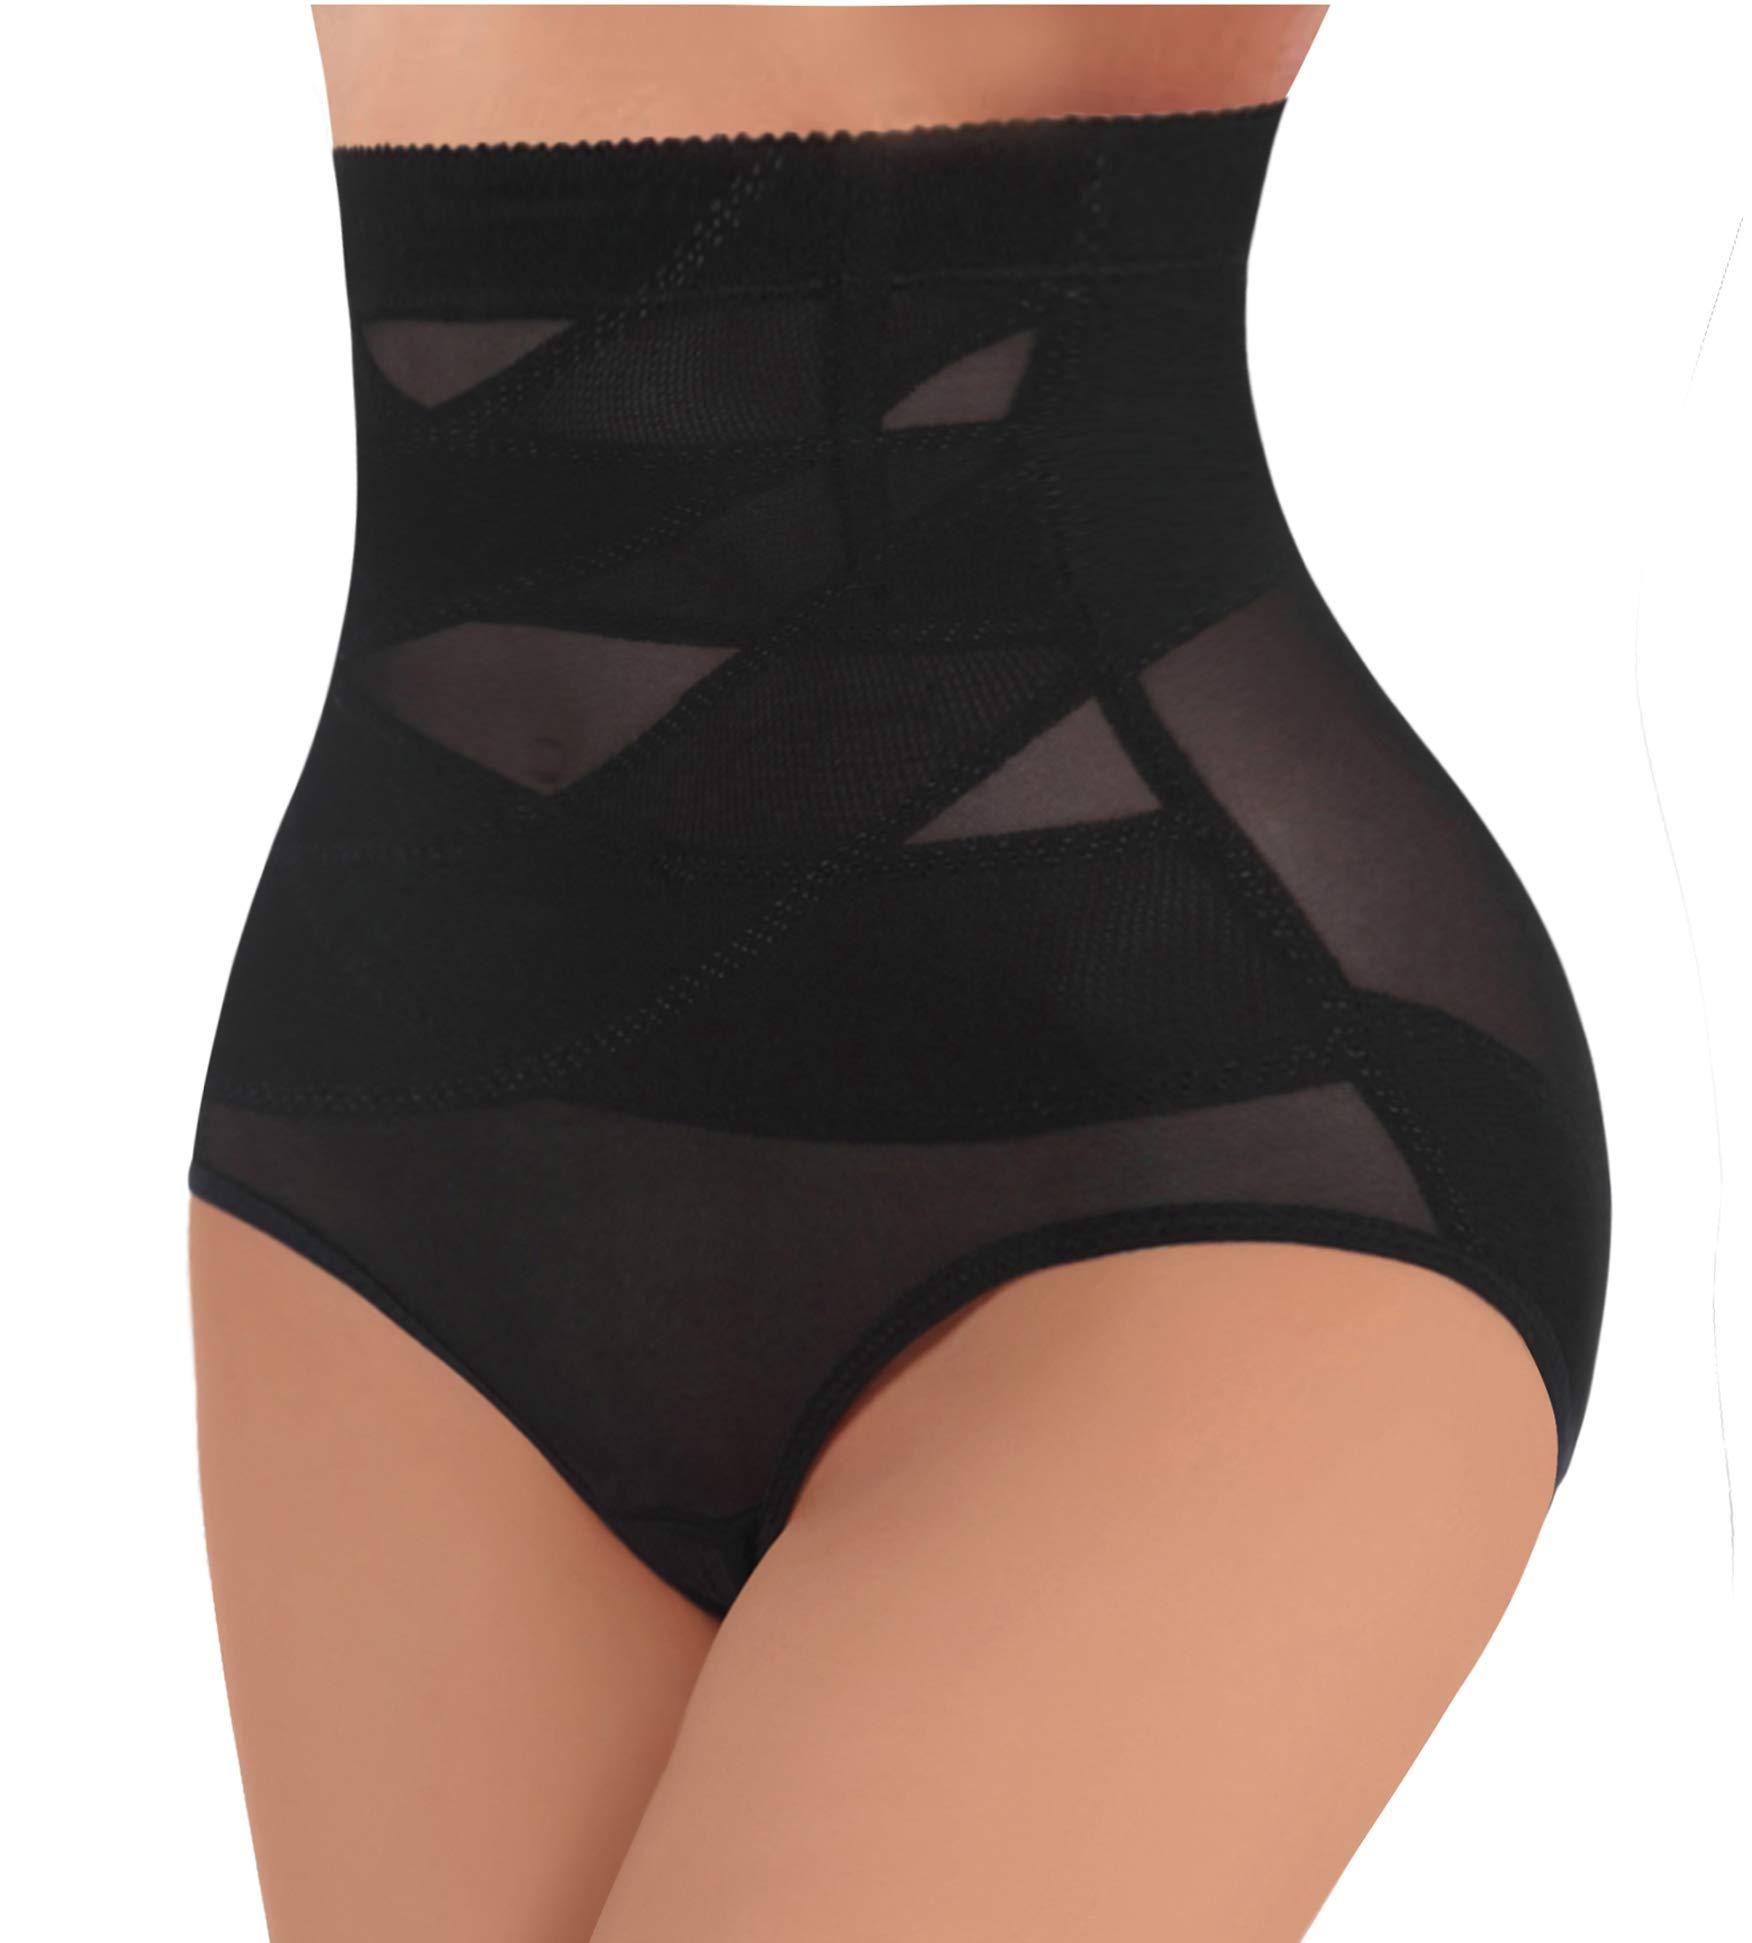 LODAY High Waist Shapewear Panties for Women Butt Lifter Tummy Trainer Seamless Underwear